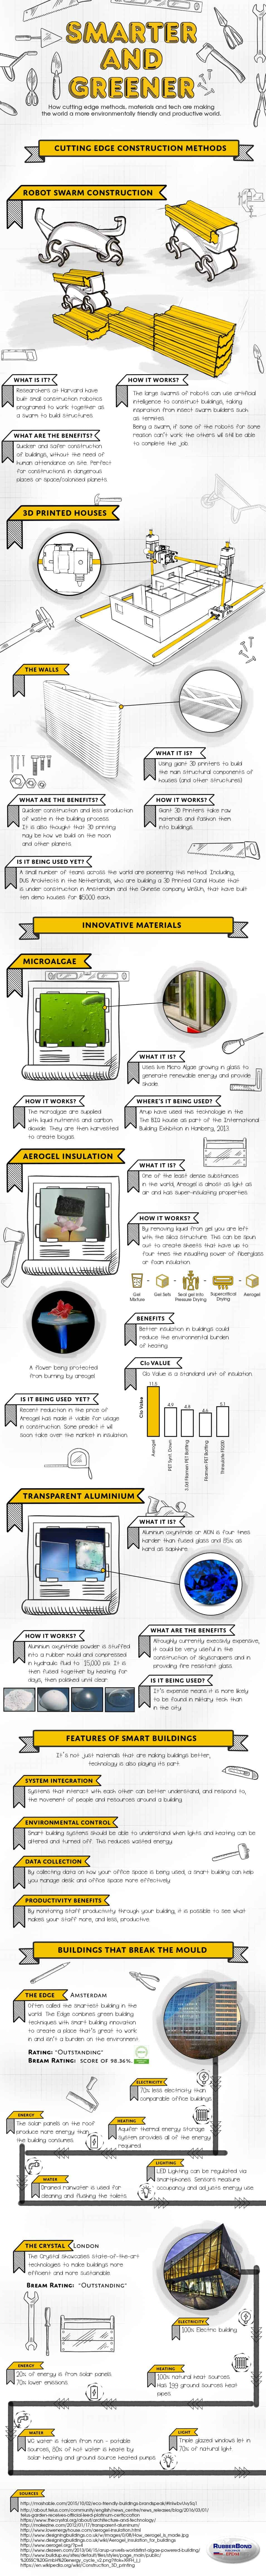 new construction methods - infographic